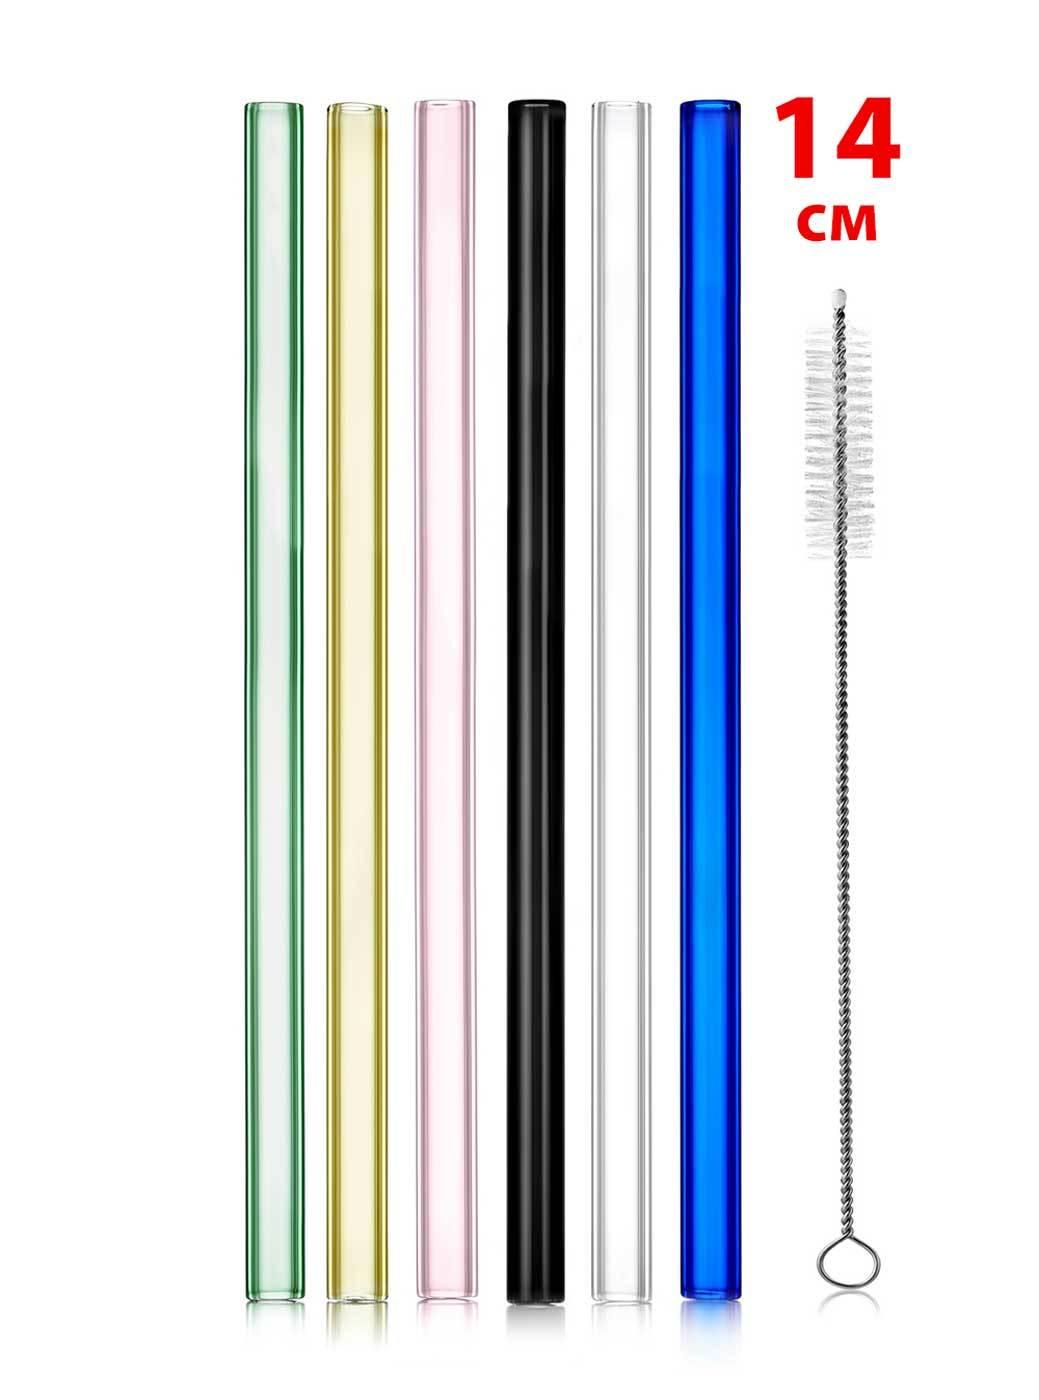 Аксессуары Стеклянная коктейльная трубочка прямая 14 см, разноцветные stekliannie-trubochki-nabor14-teastar.jpg